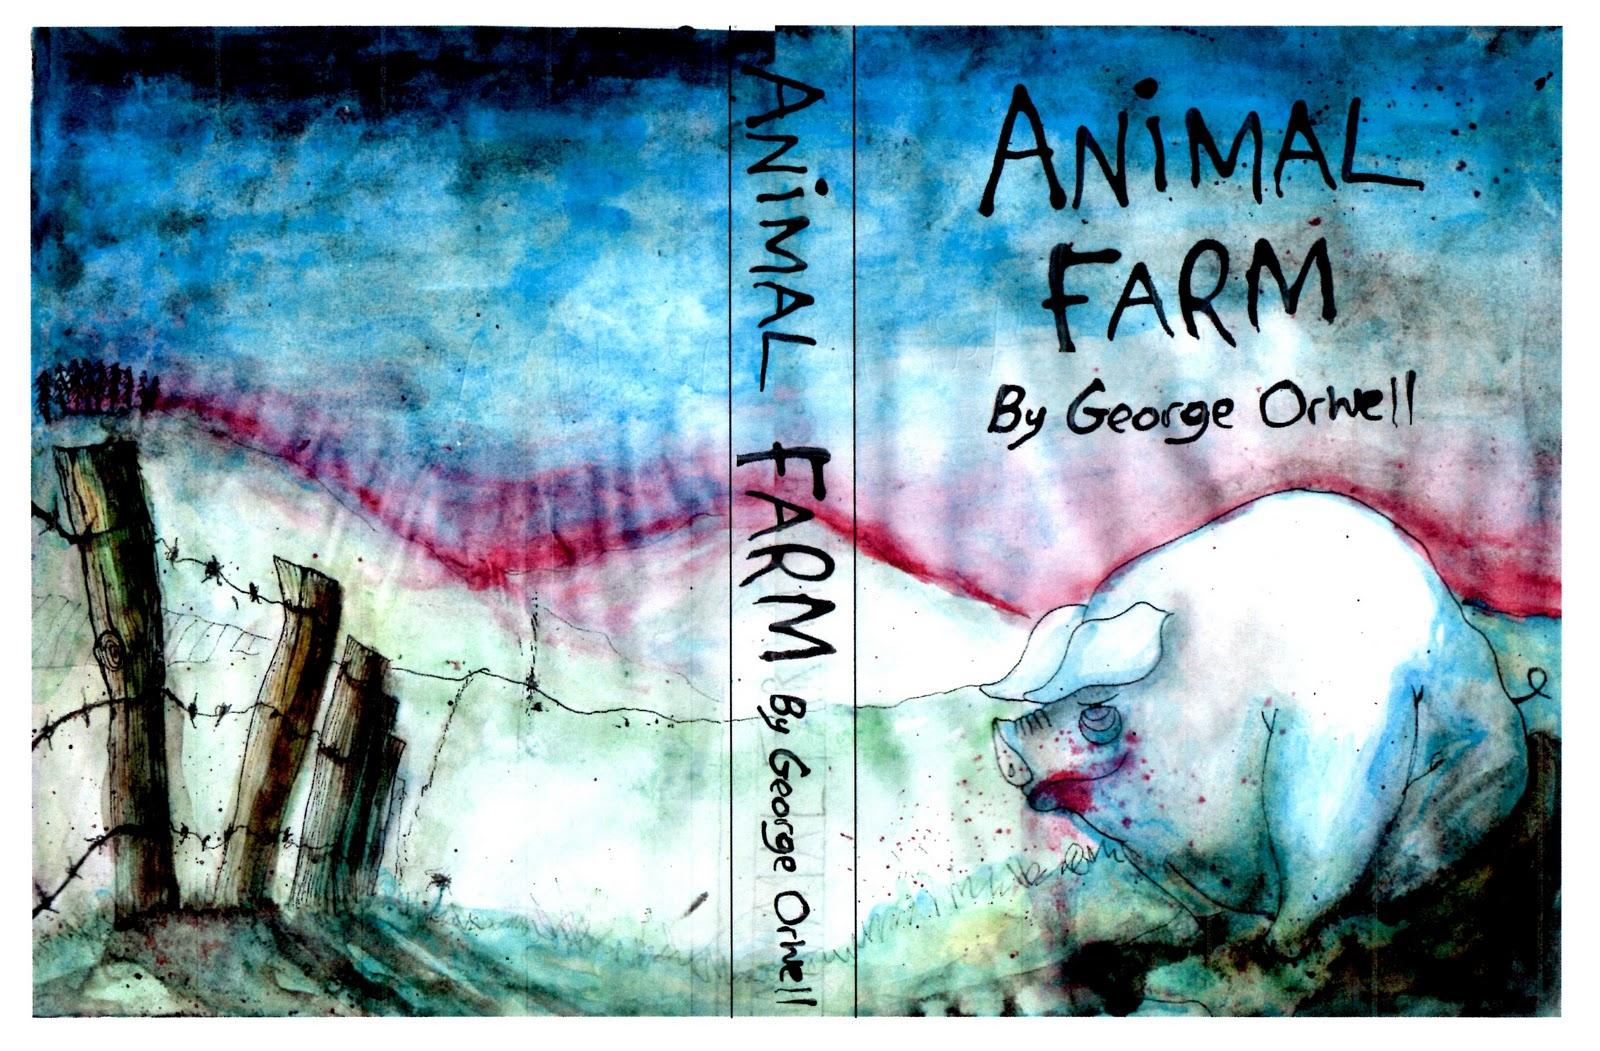 animal farm russian revolution essay napoleon a pig in animal farm  animal farm george orwell essay essays animal farm and russian revolution essay